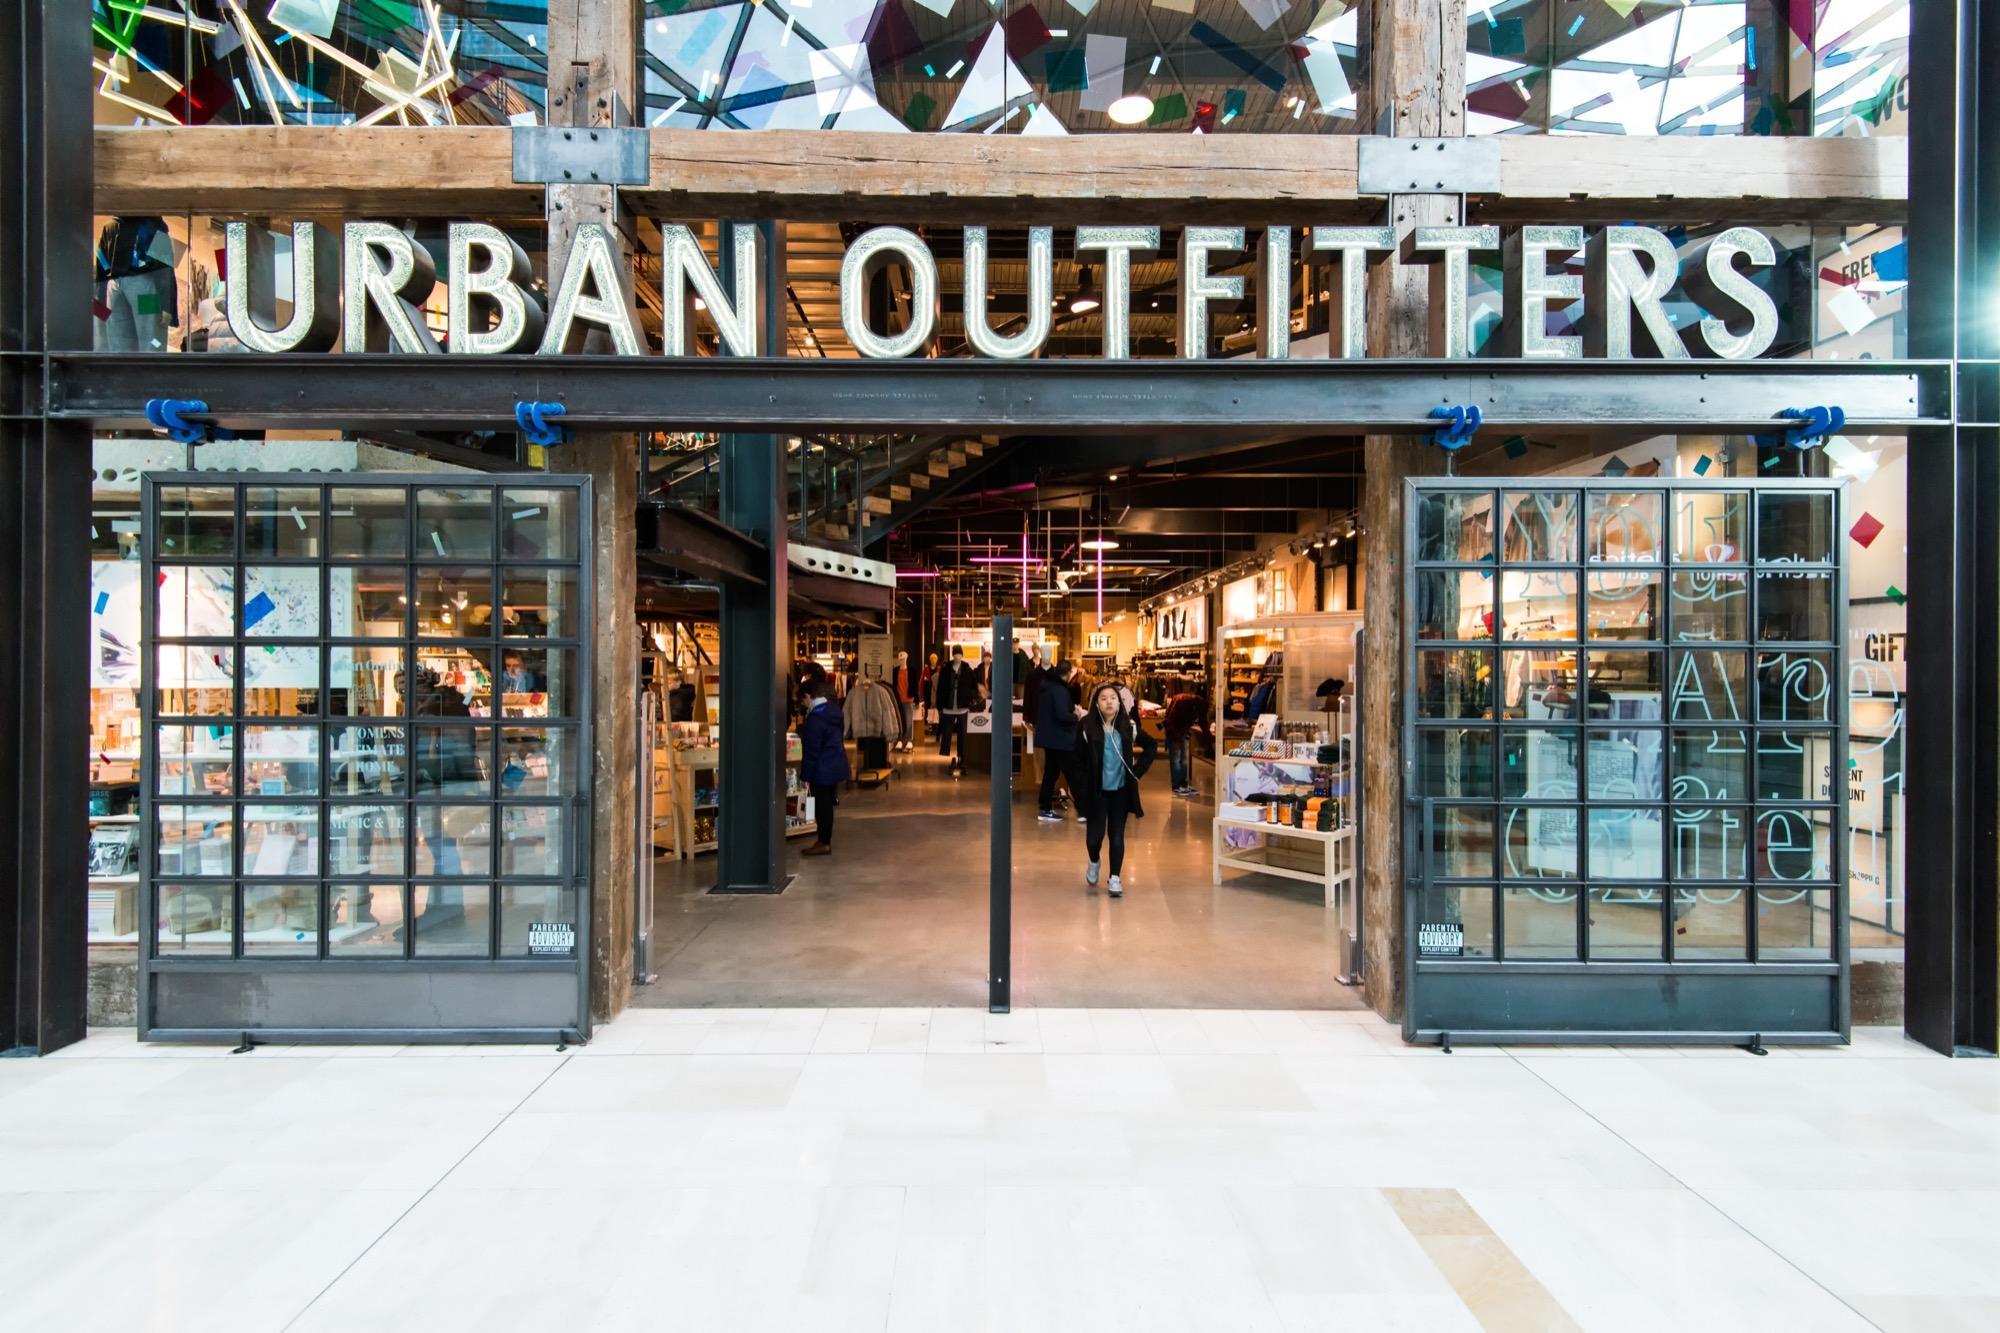 URBAN OUTFITTERS DE GUTSCHEIN